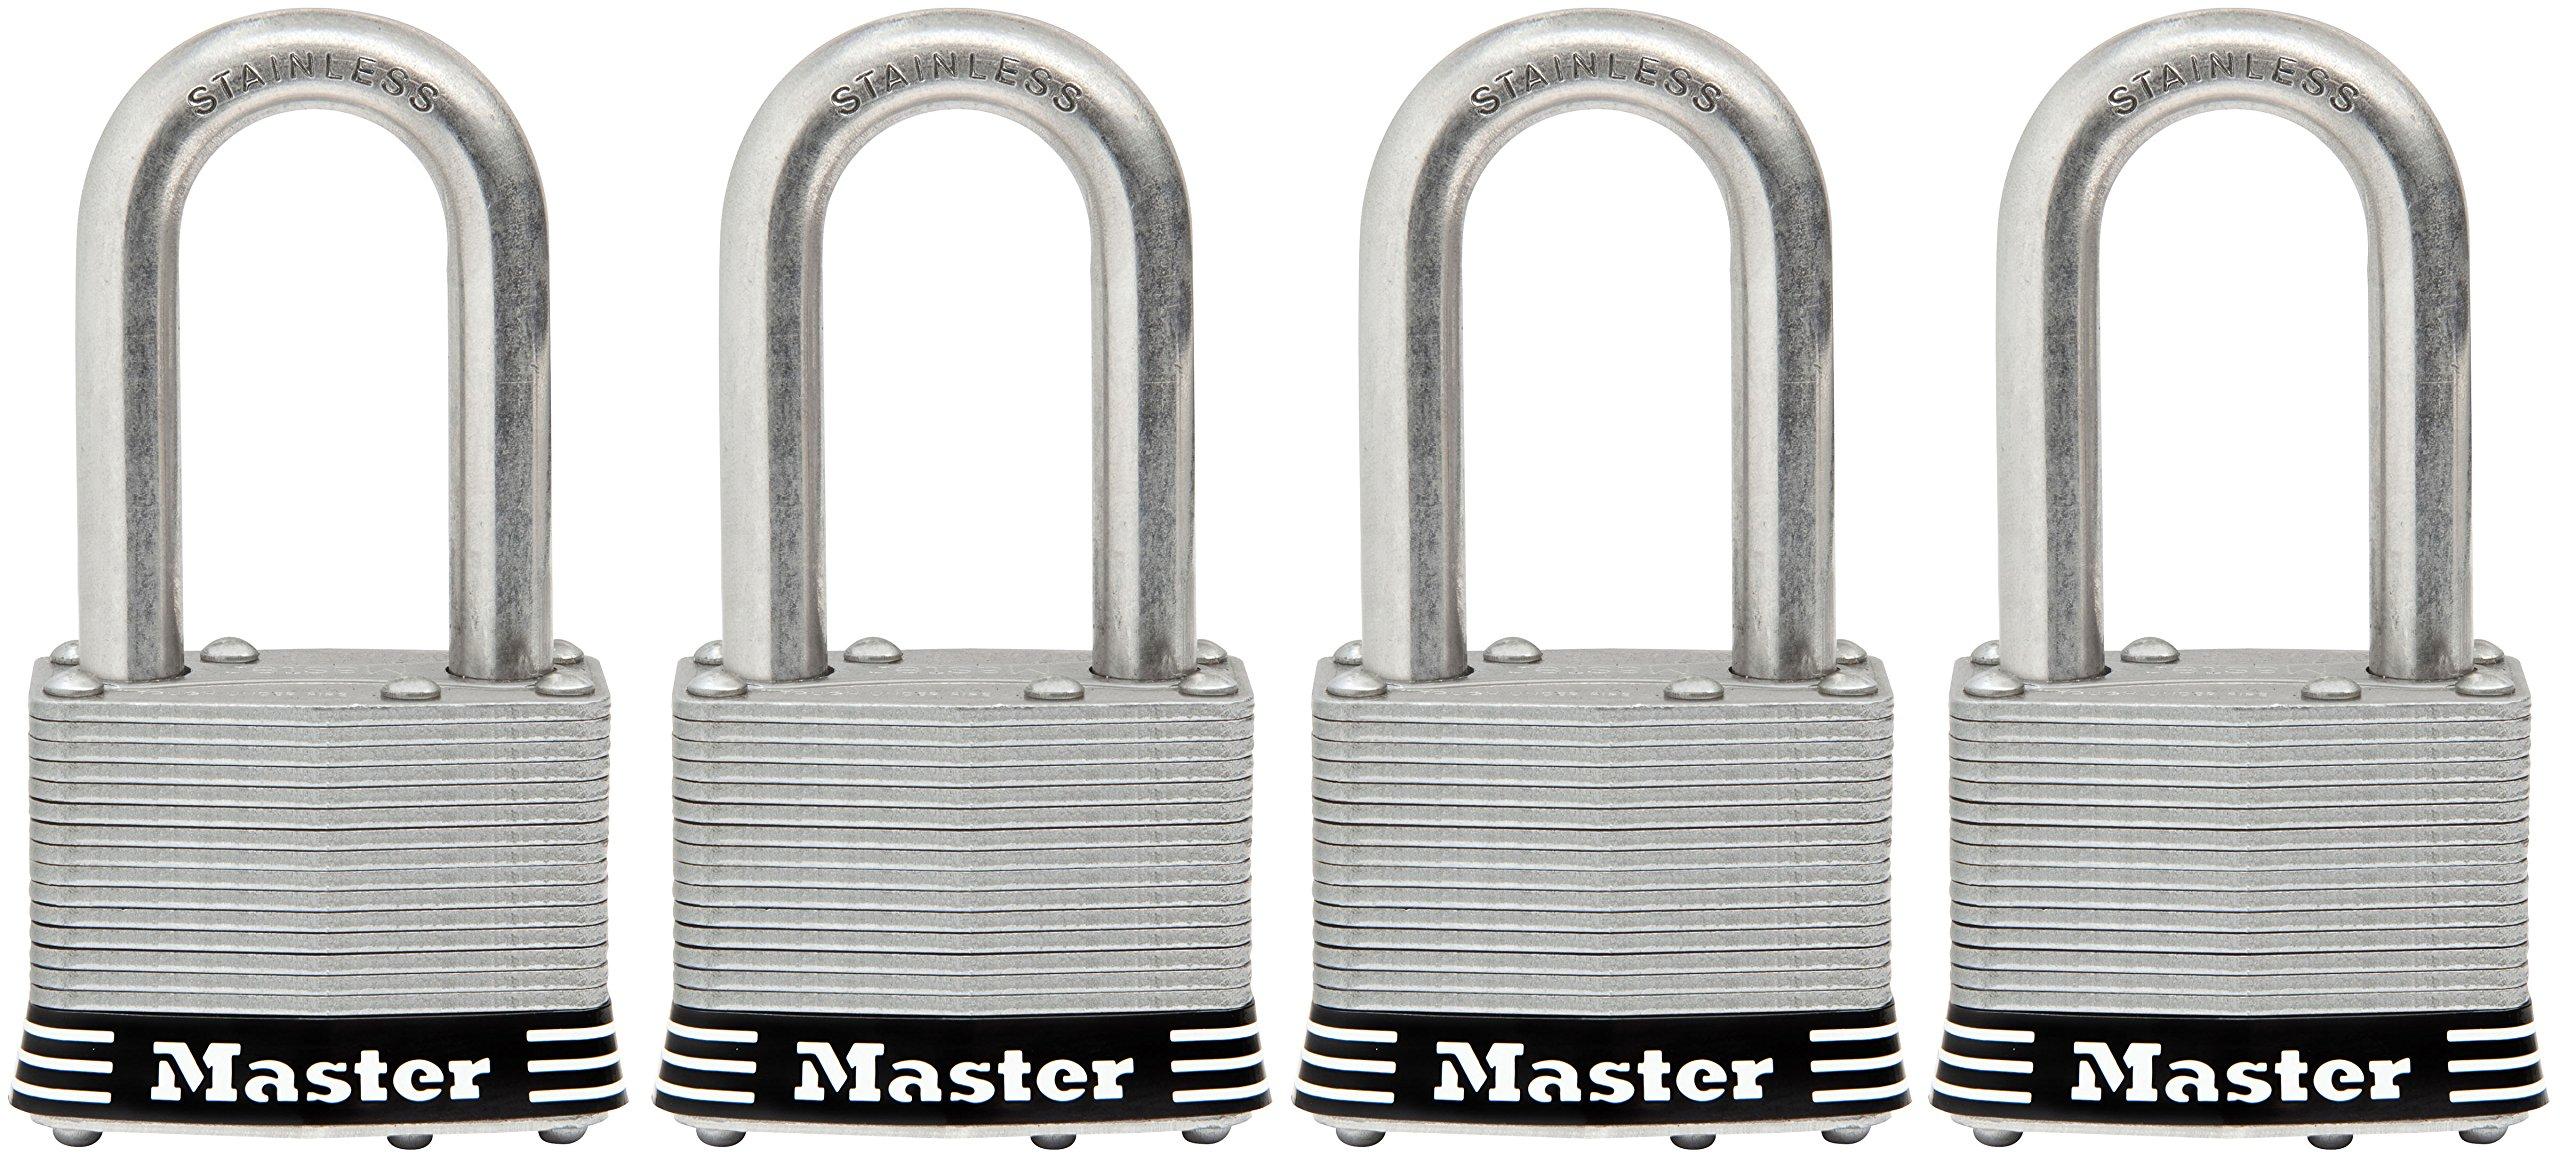 Master Lock Padlock, Laminated Stainless Steel Lock, 1-3/4 in. Wide, 1SSQLF (Pack of 4-Keyed Alike)